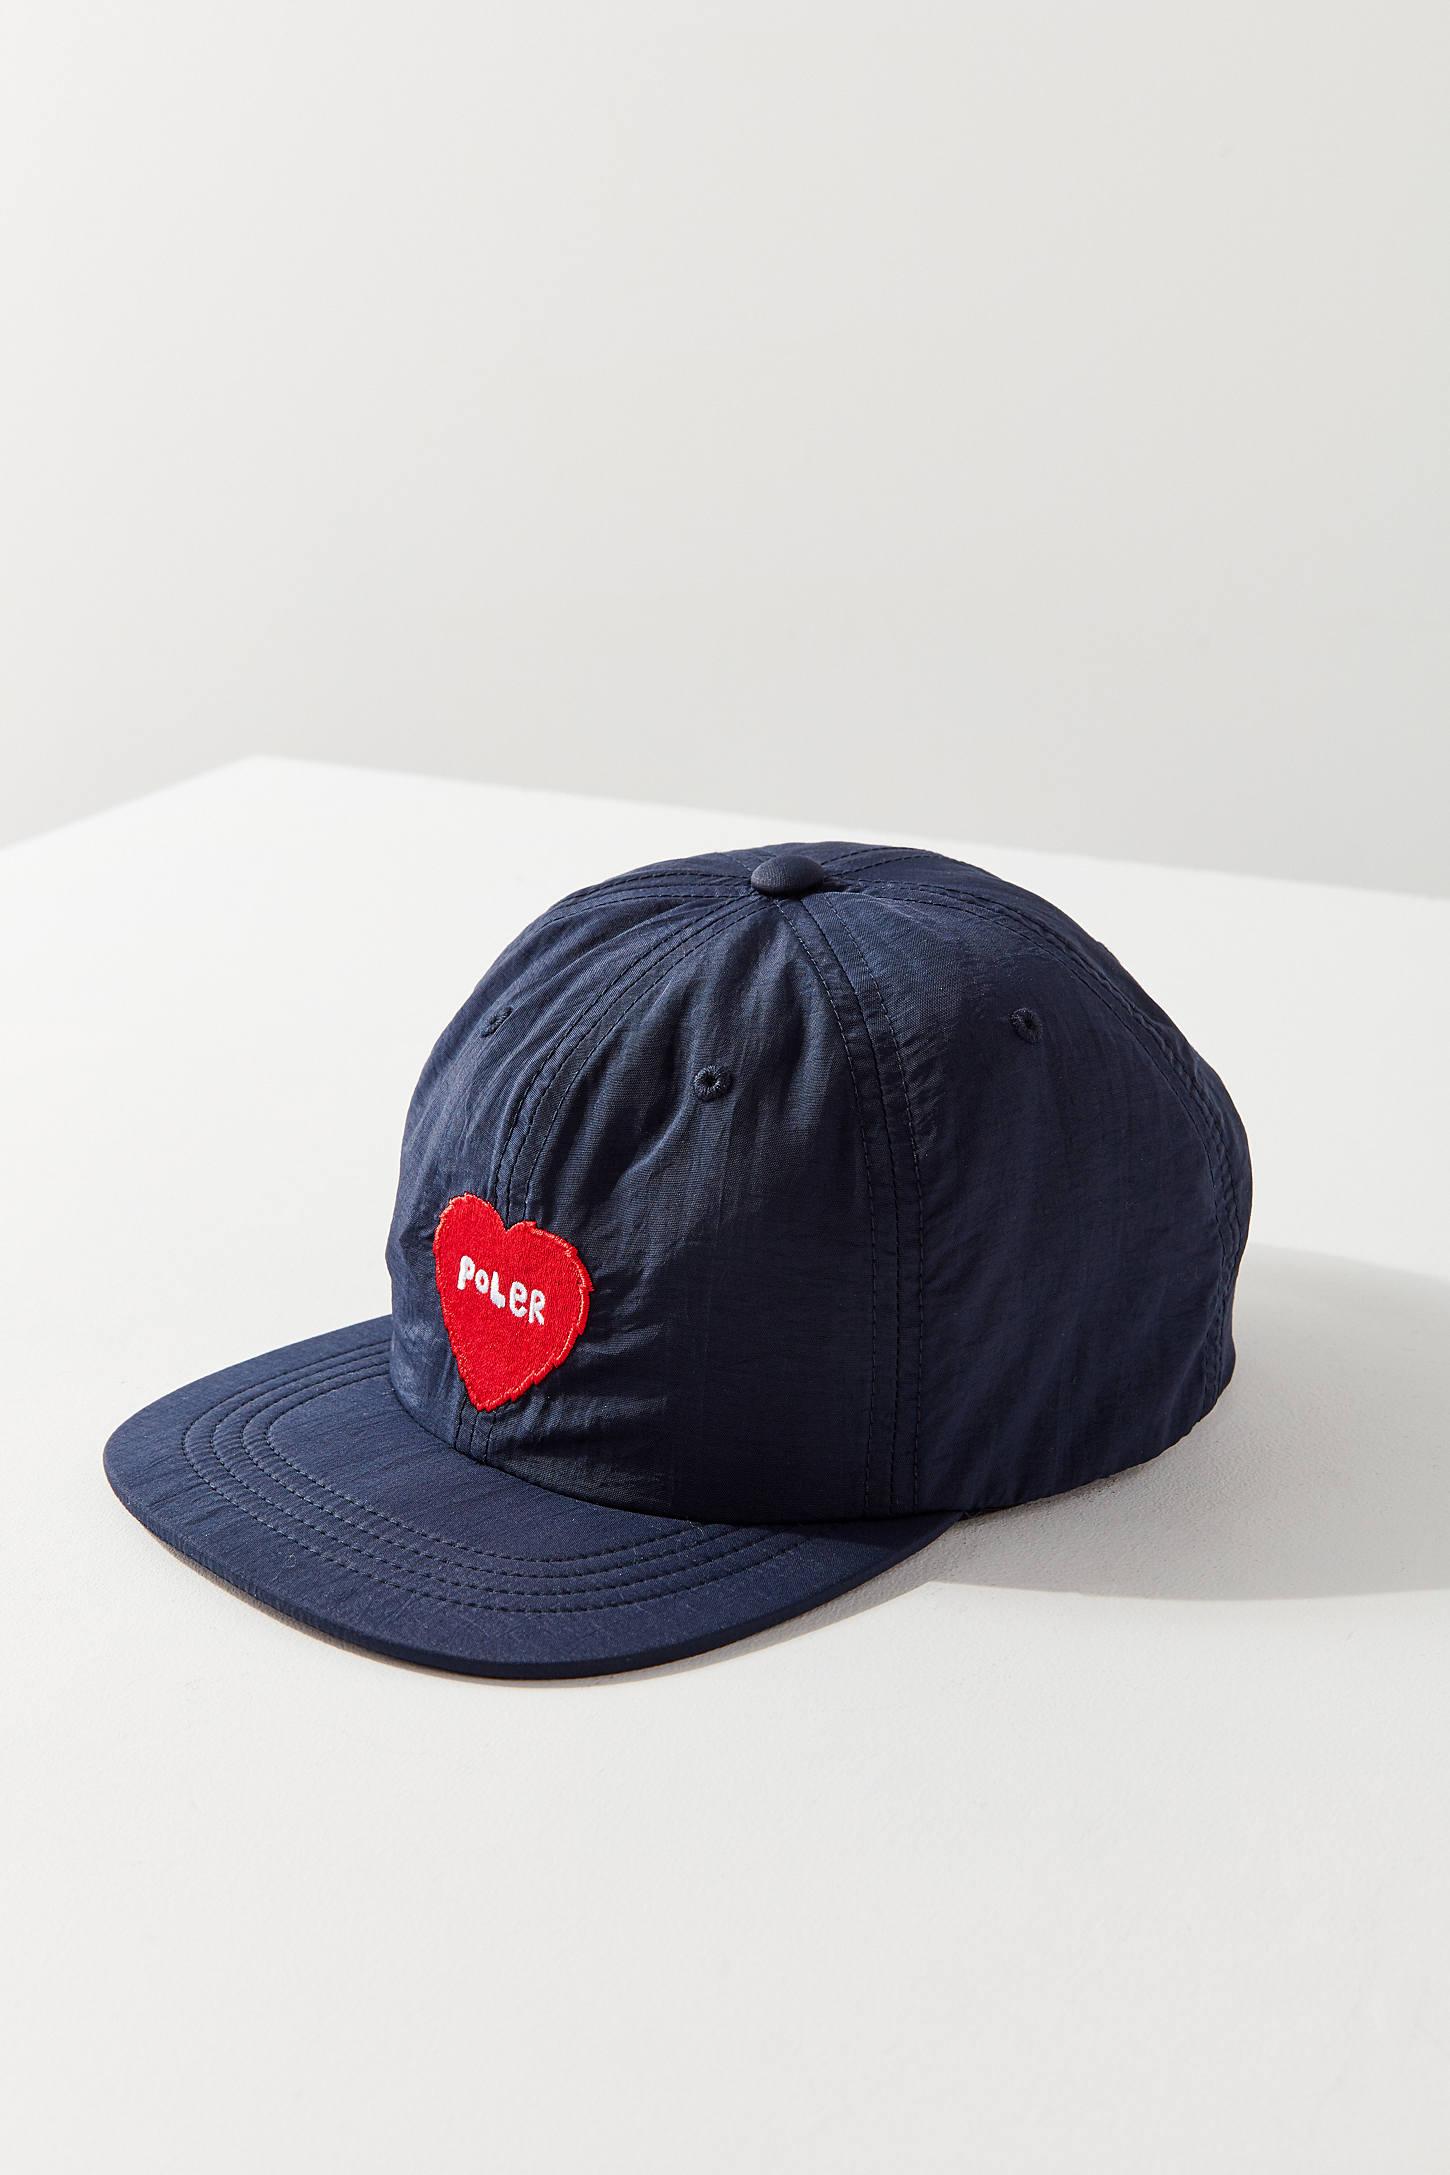 Poler Furry Heart Floppy Baseball Hat  f17352a6cc6